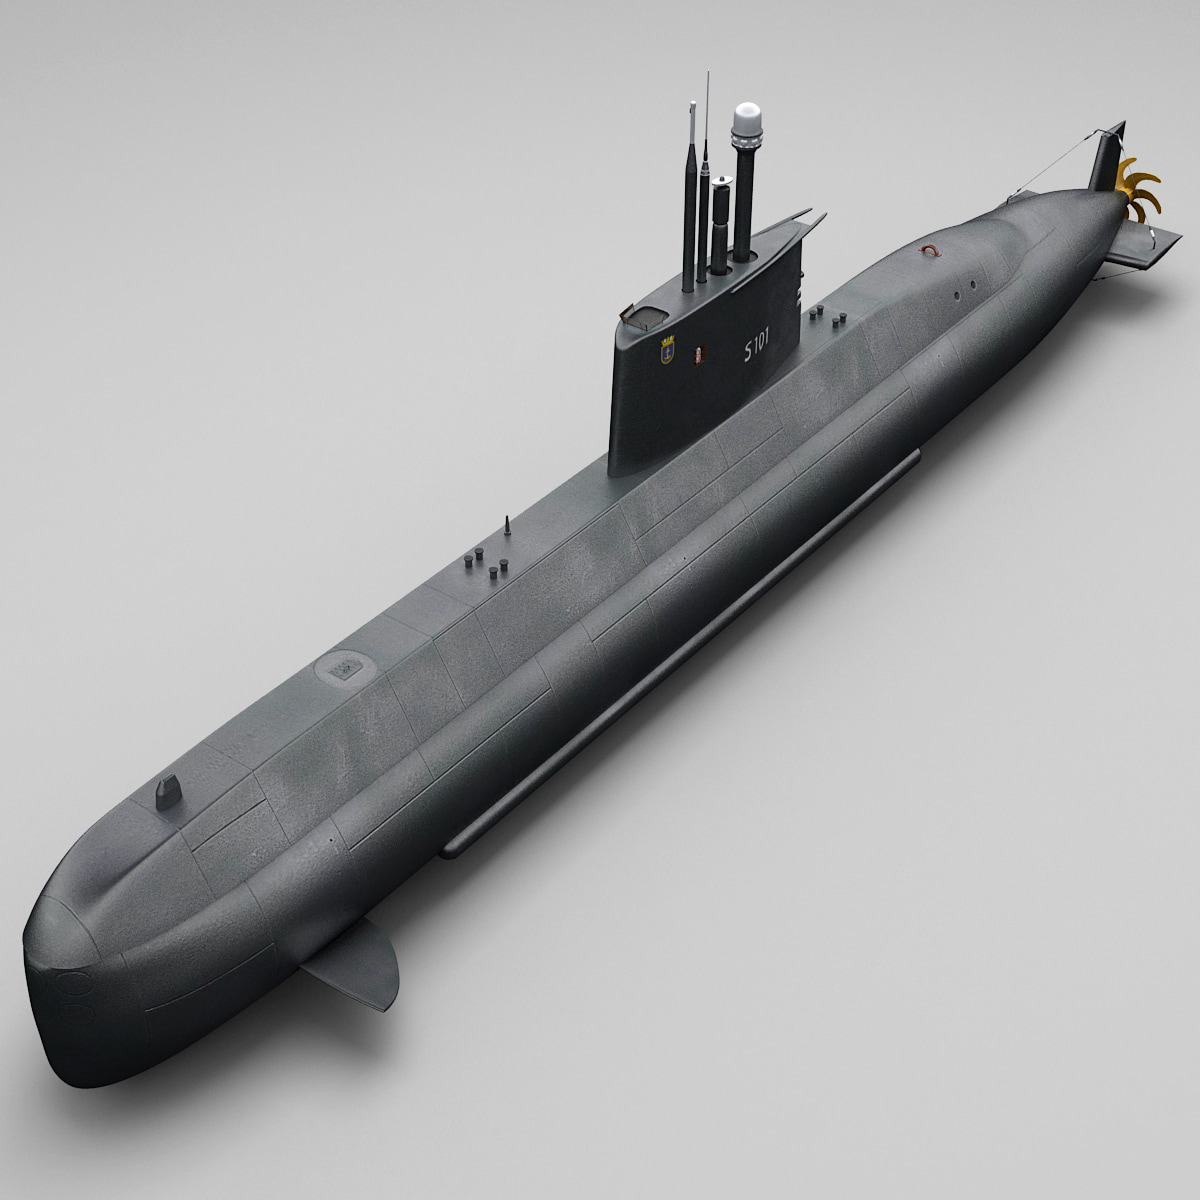 Germany_Submarine_Type_209_0001.jpg